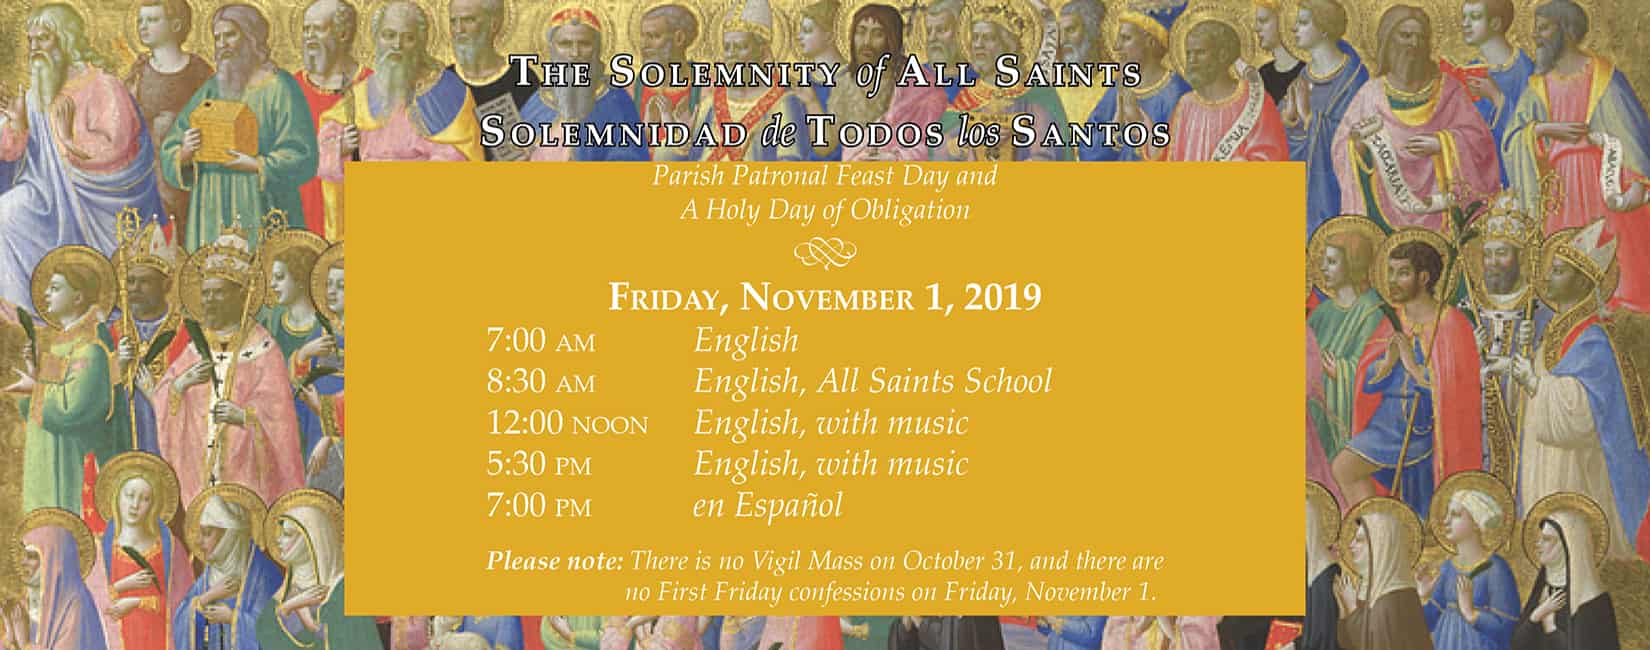 All Saints Catholic Church - All Saints Day Mass Schedule